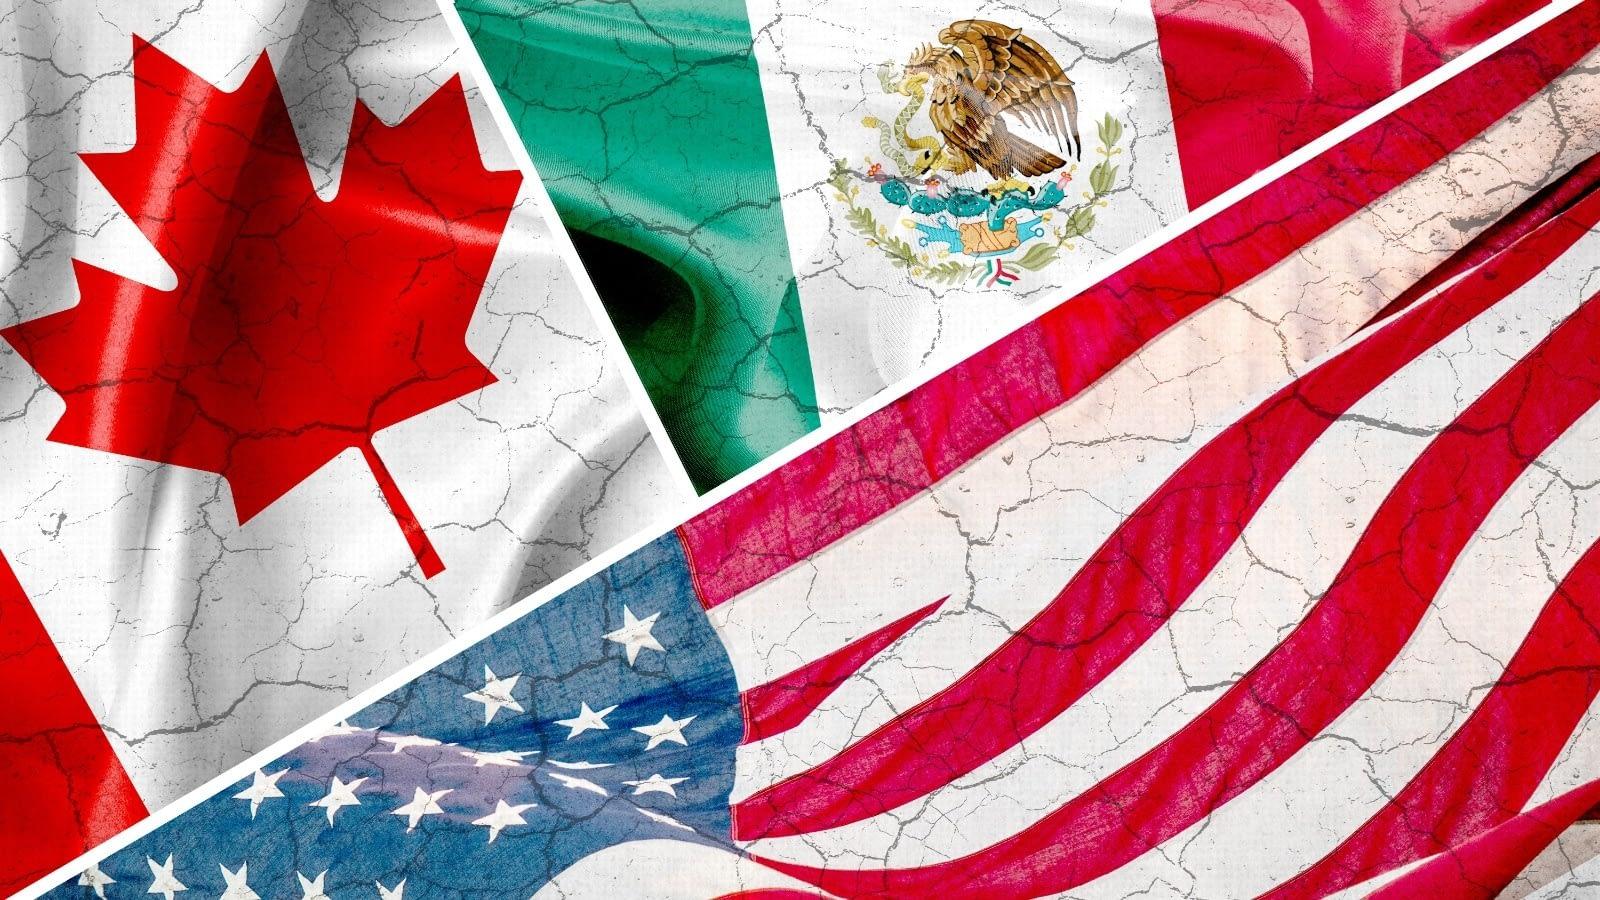 Exports grew 760% with NAFTA